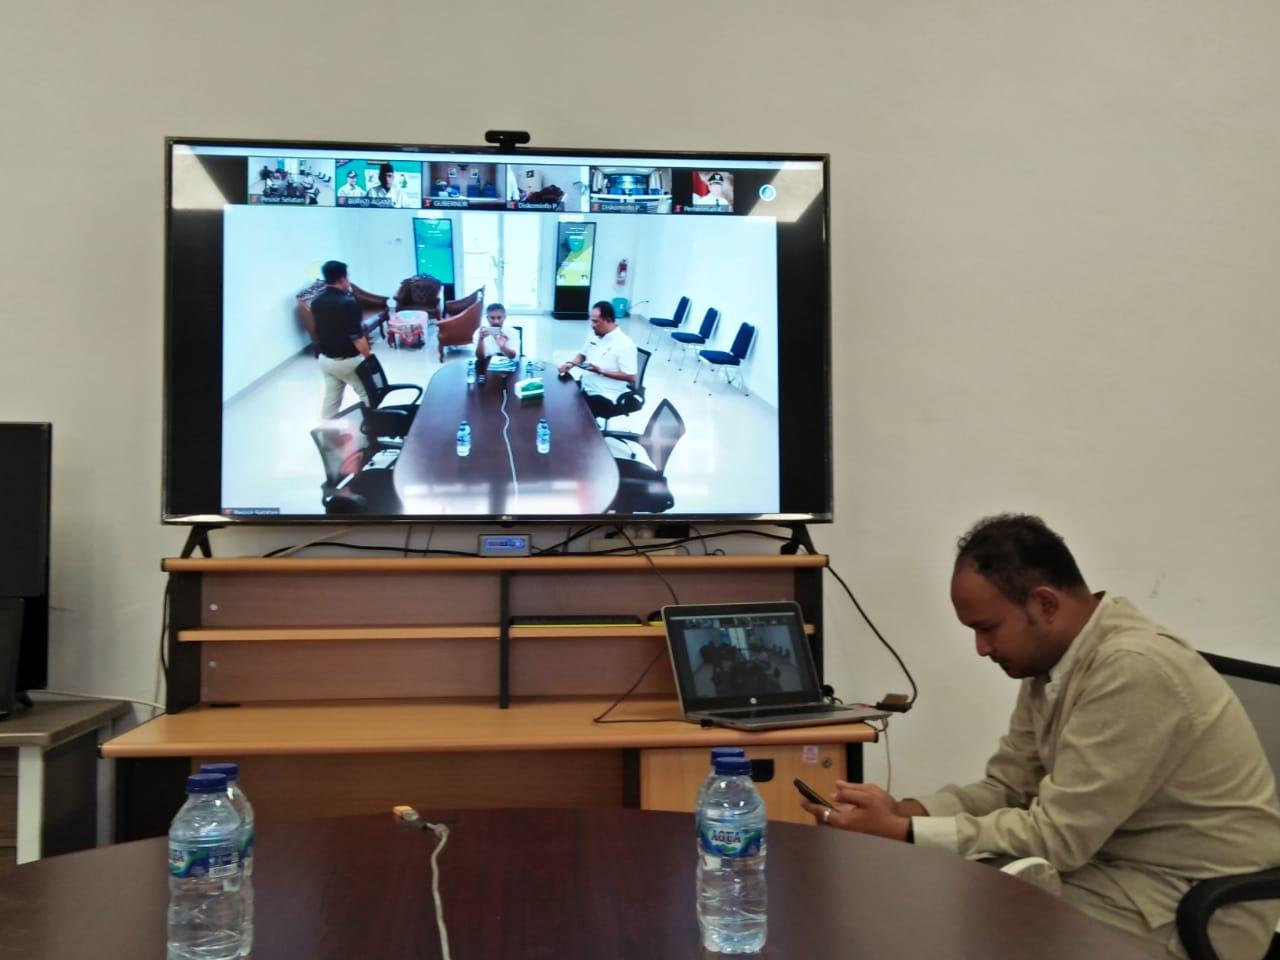 Gubernur Sumatera Barat akan lakukan Vidcon Perkembangan Penanganan Covid-19 dengan Bupati/ Walikota